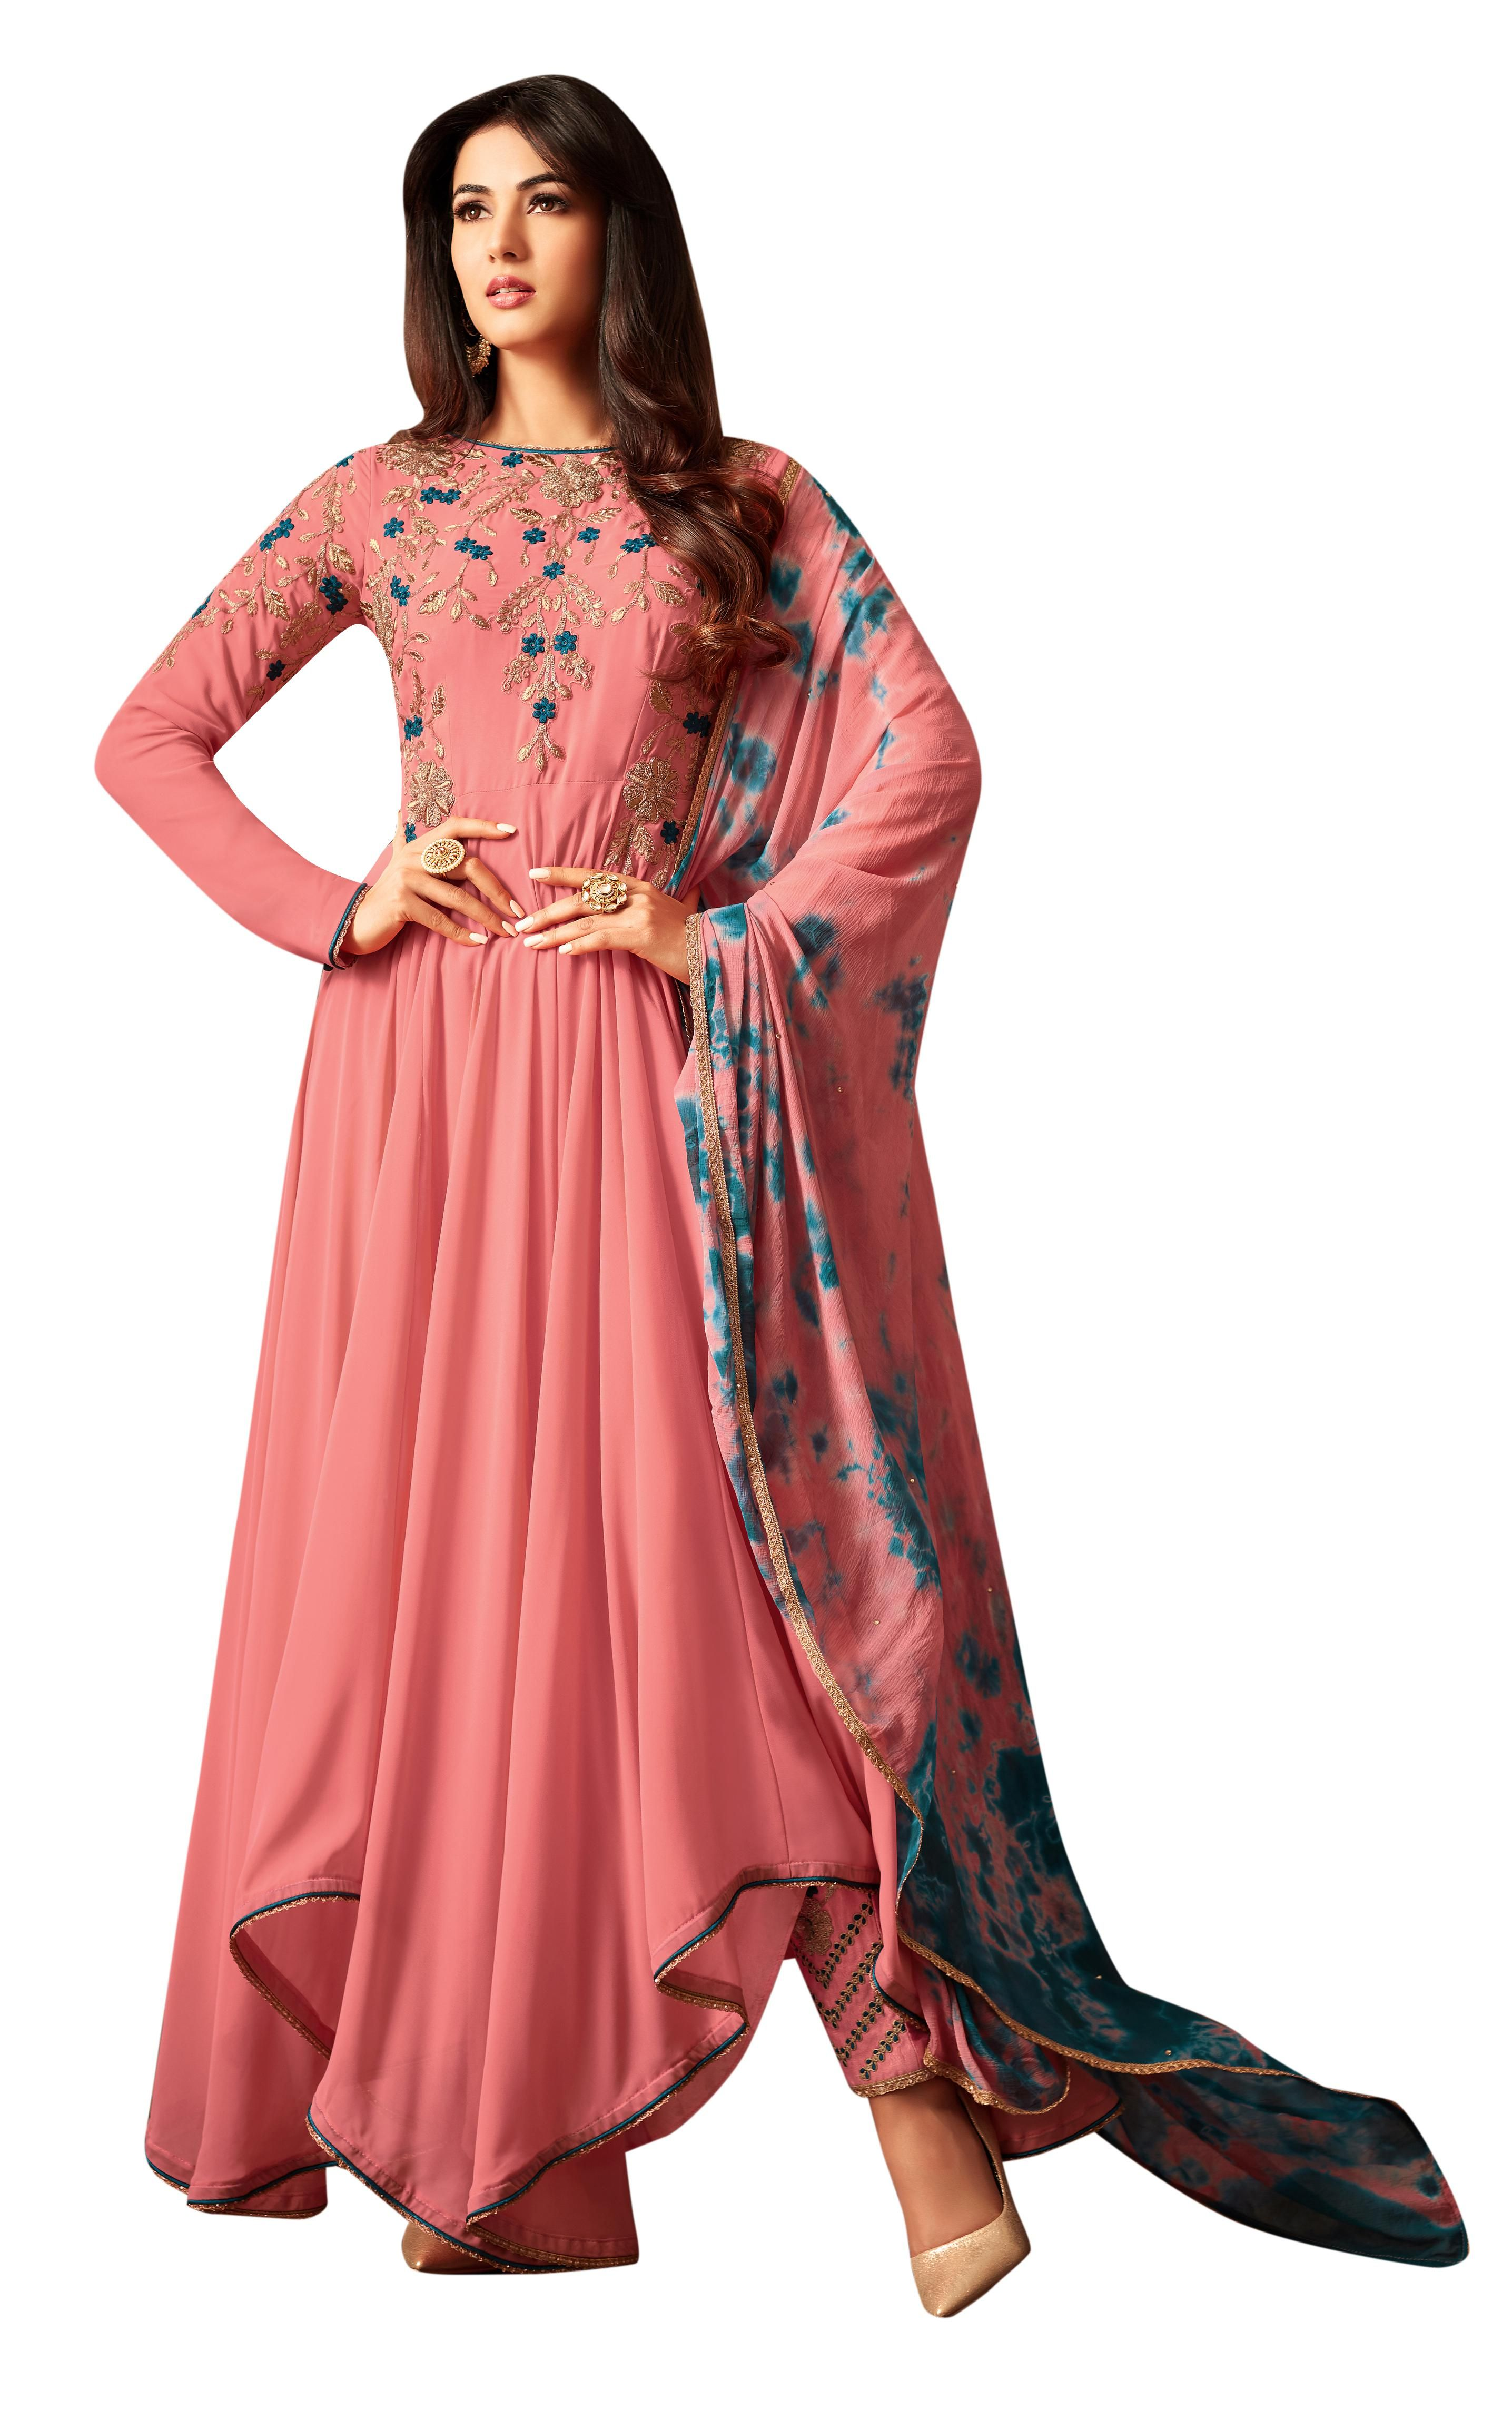 6eb7ba72d0 Peach georgette asymmetrical style suit for ethnic wear. Indian ethnic wear  online shopping best destination. Yeah! Shop now.